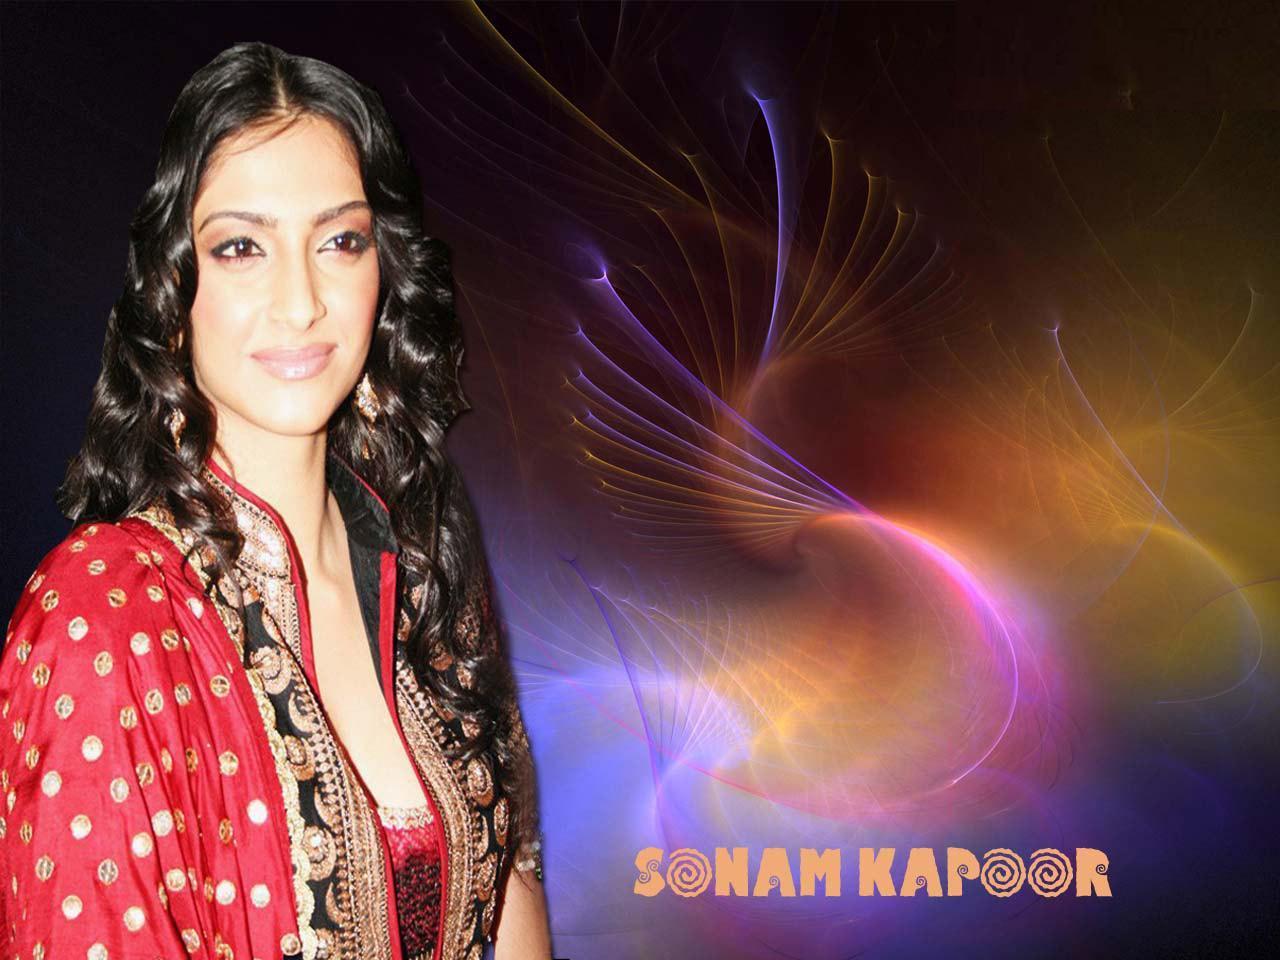 Sonam Kapoor Wallpapers: Sonam Kapoor Players Girl Wallpapers